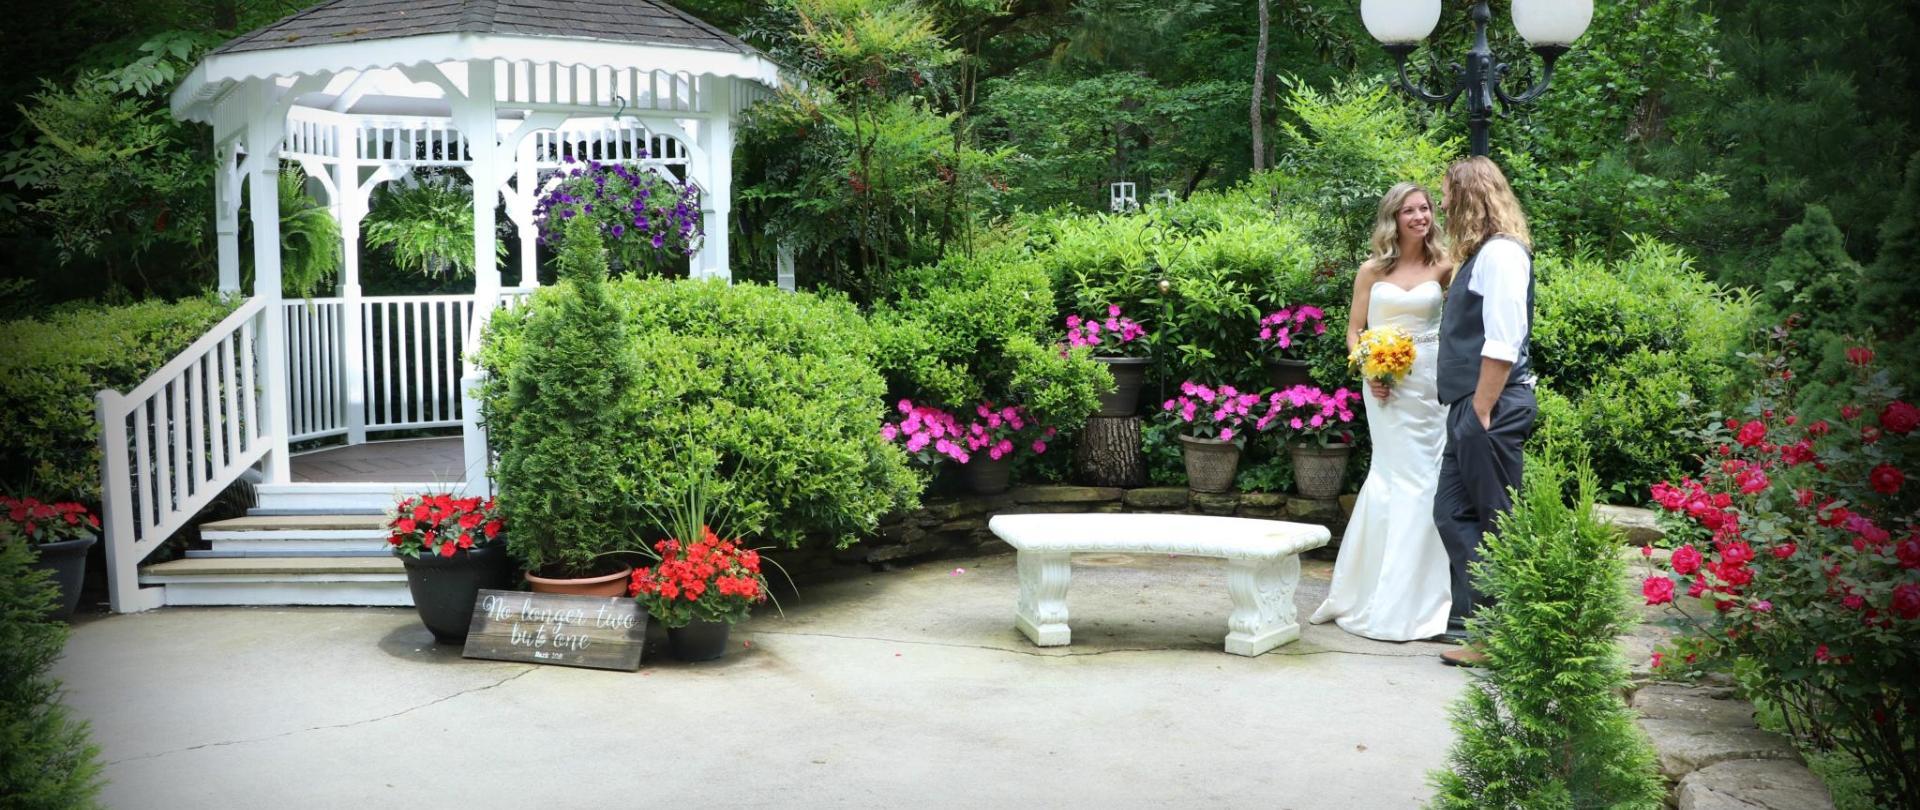 CATP - 2019 Gazebo Garden Couple 01.jpg